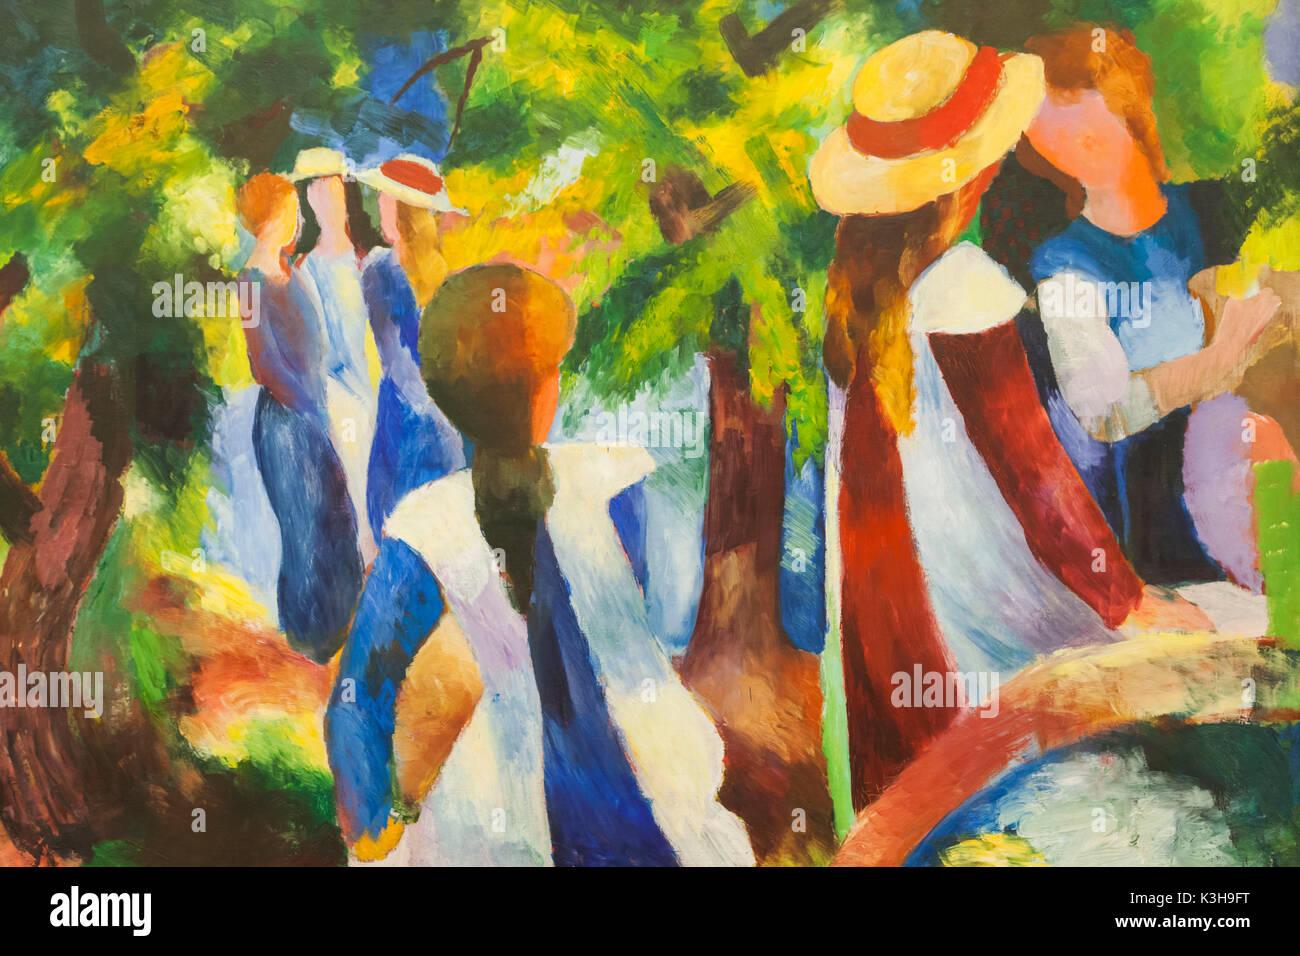 "In Germania, in Baviera, Monaco di Baviera, la Pinakothek Museo di Arte Moderna (Pinakothek der Moderne), Pittura intitolato ""adchen unter Baumen' da August Macke datata 1914 Immagini Stock"